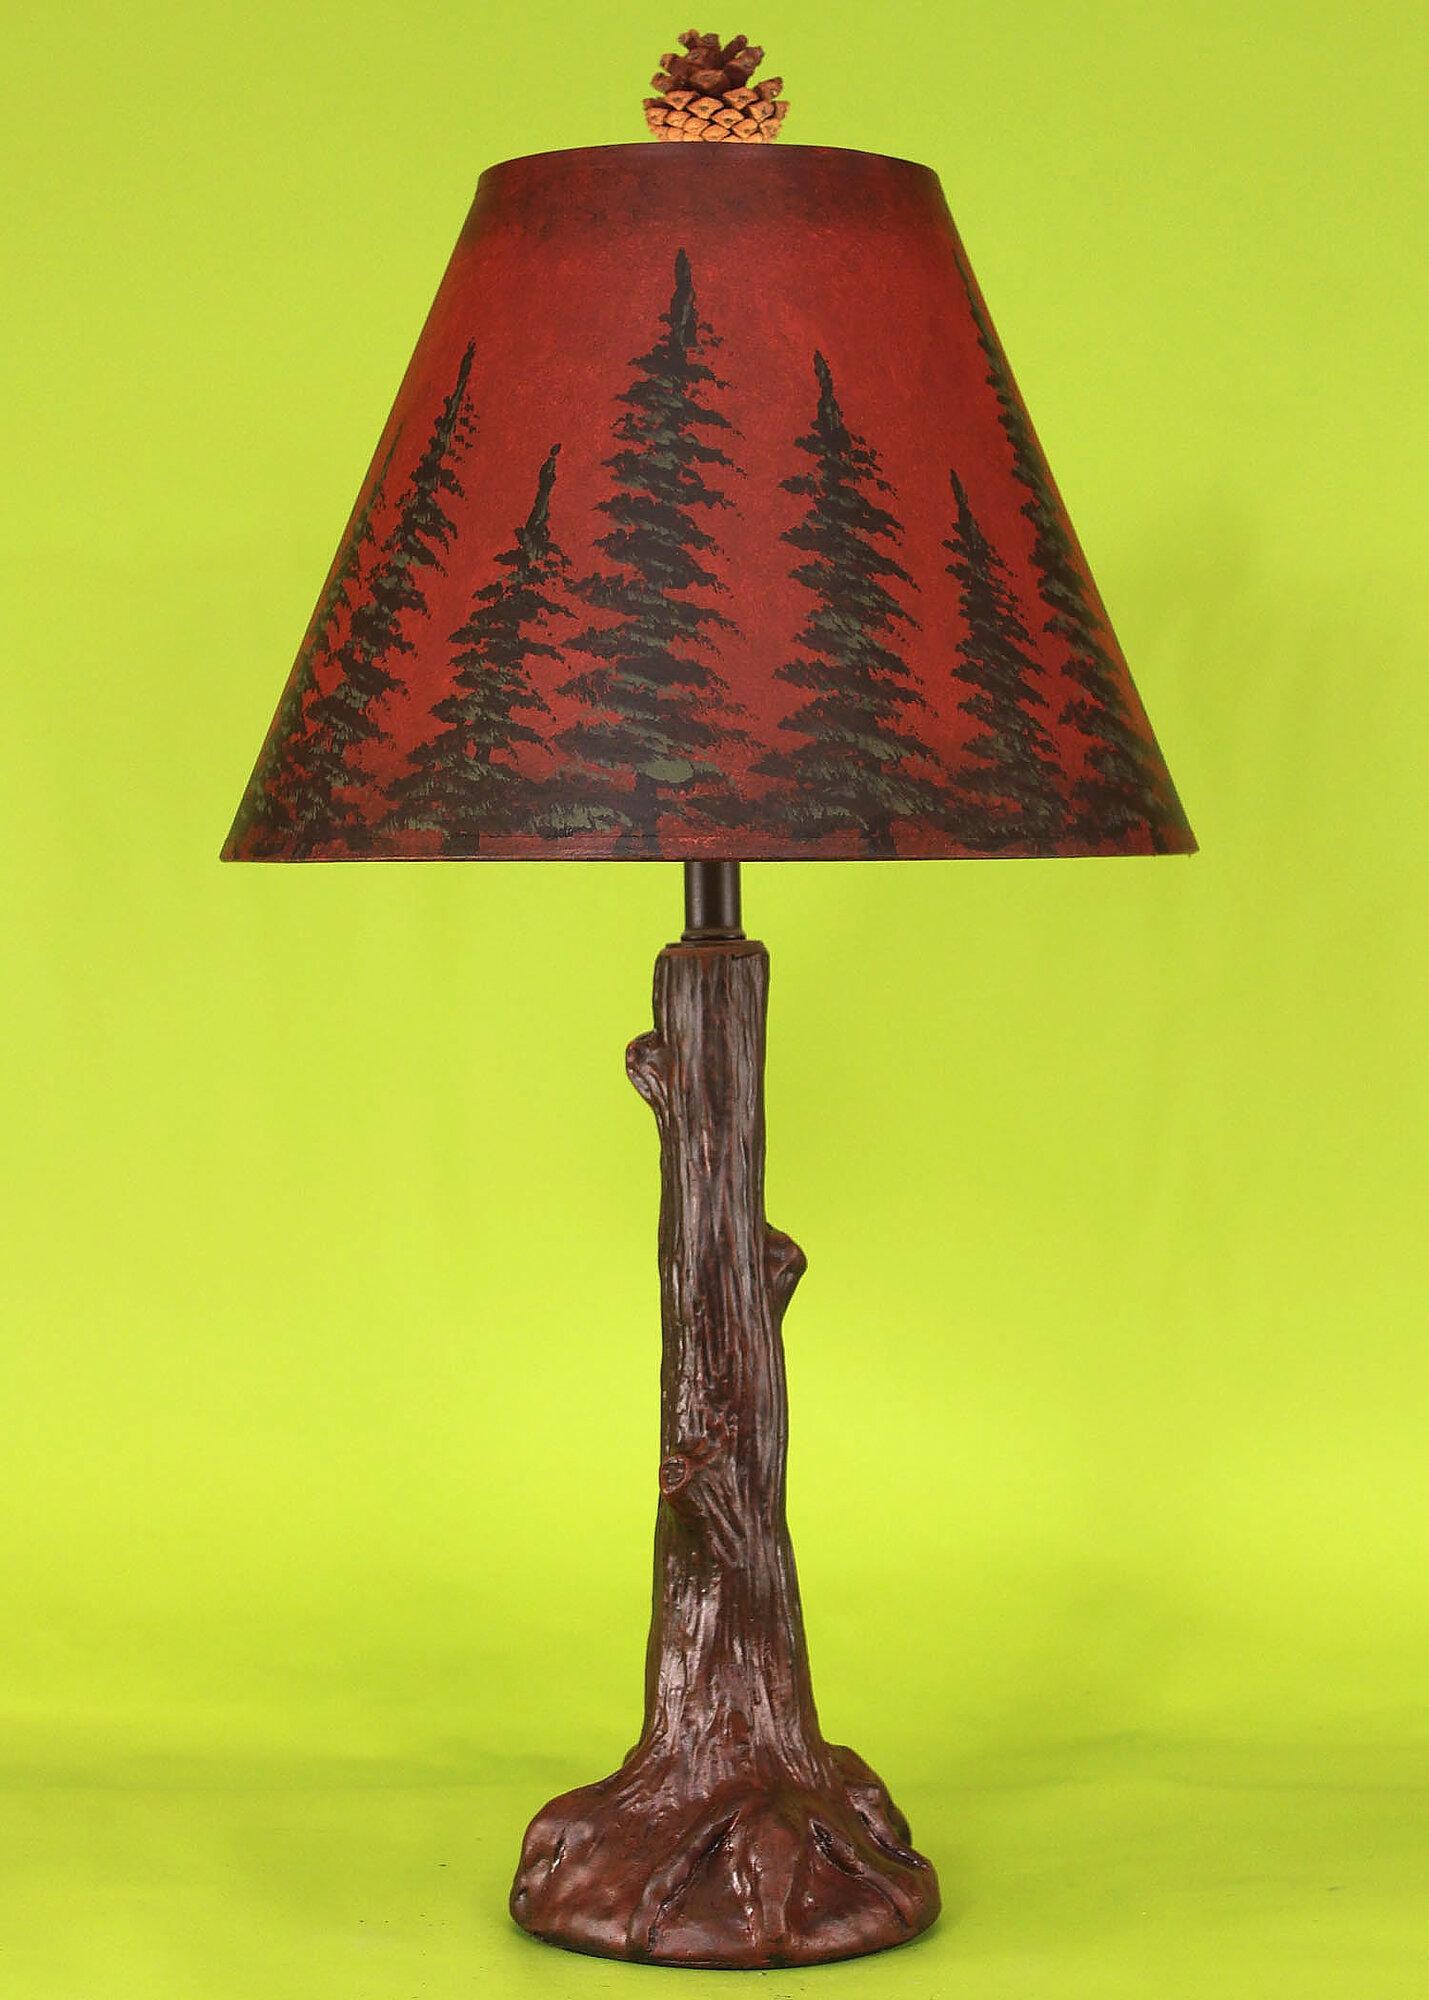 coast lamp mfg rustic living tree trunk 27 table lamp ebay. Black Bedroom Furniture Sets. Home Design Ideas